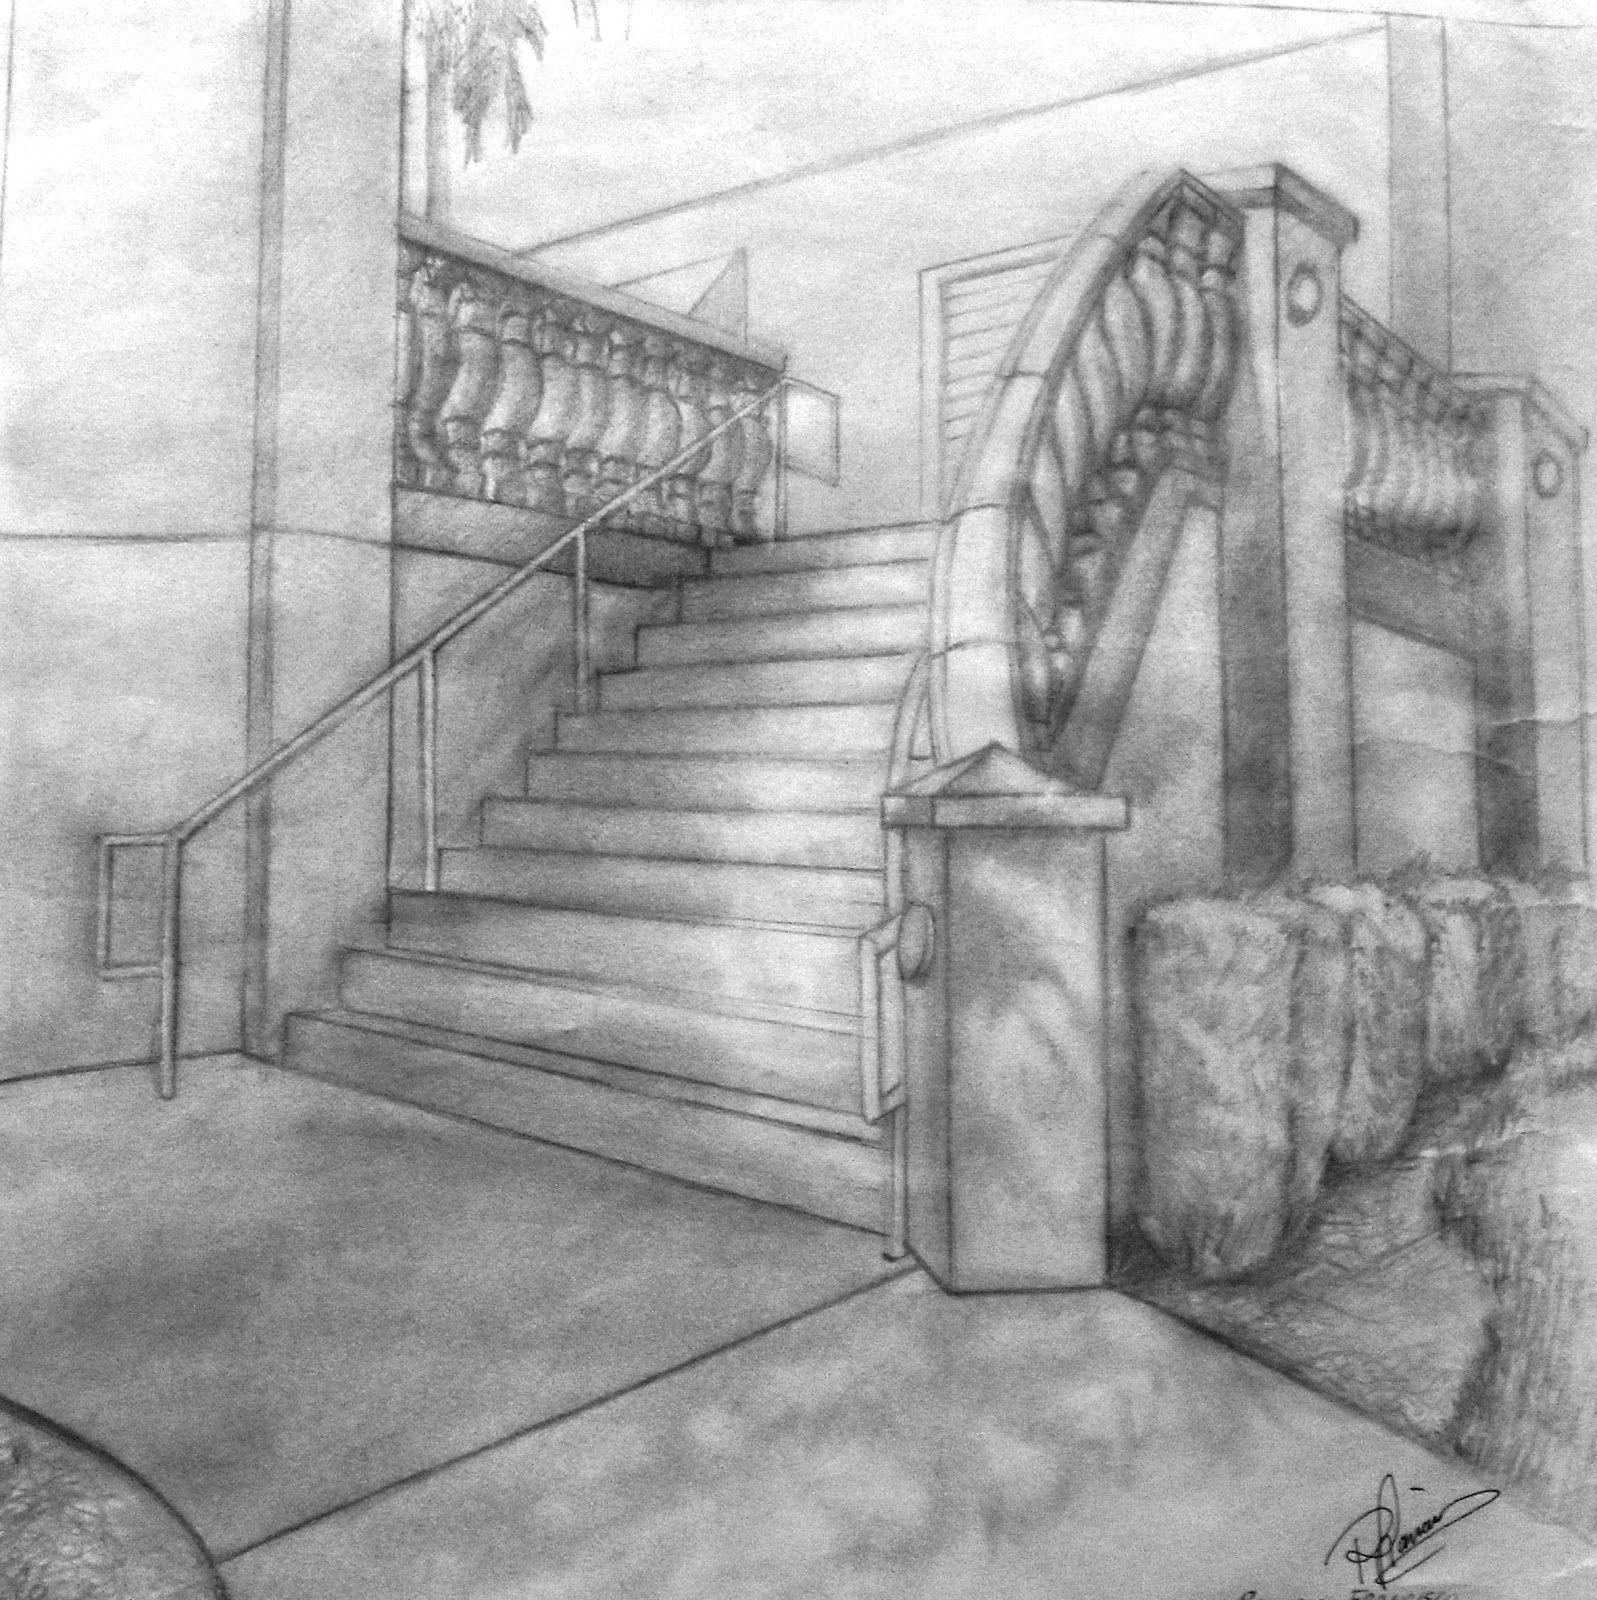 The Art Blog of Ronwaldo Francisco: October 2012